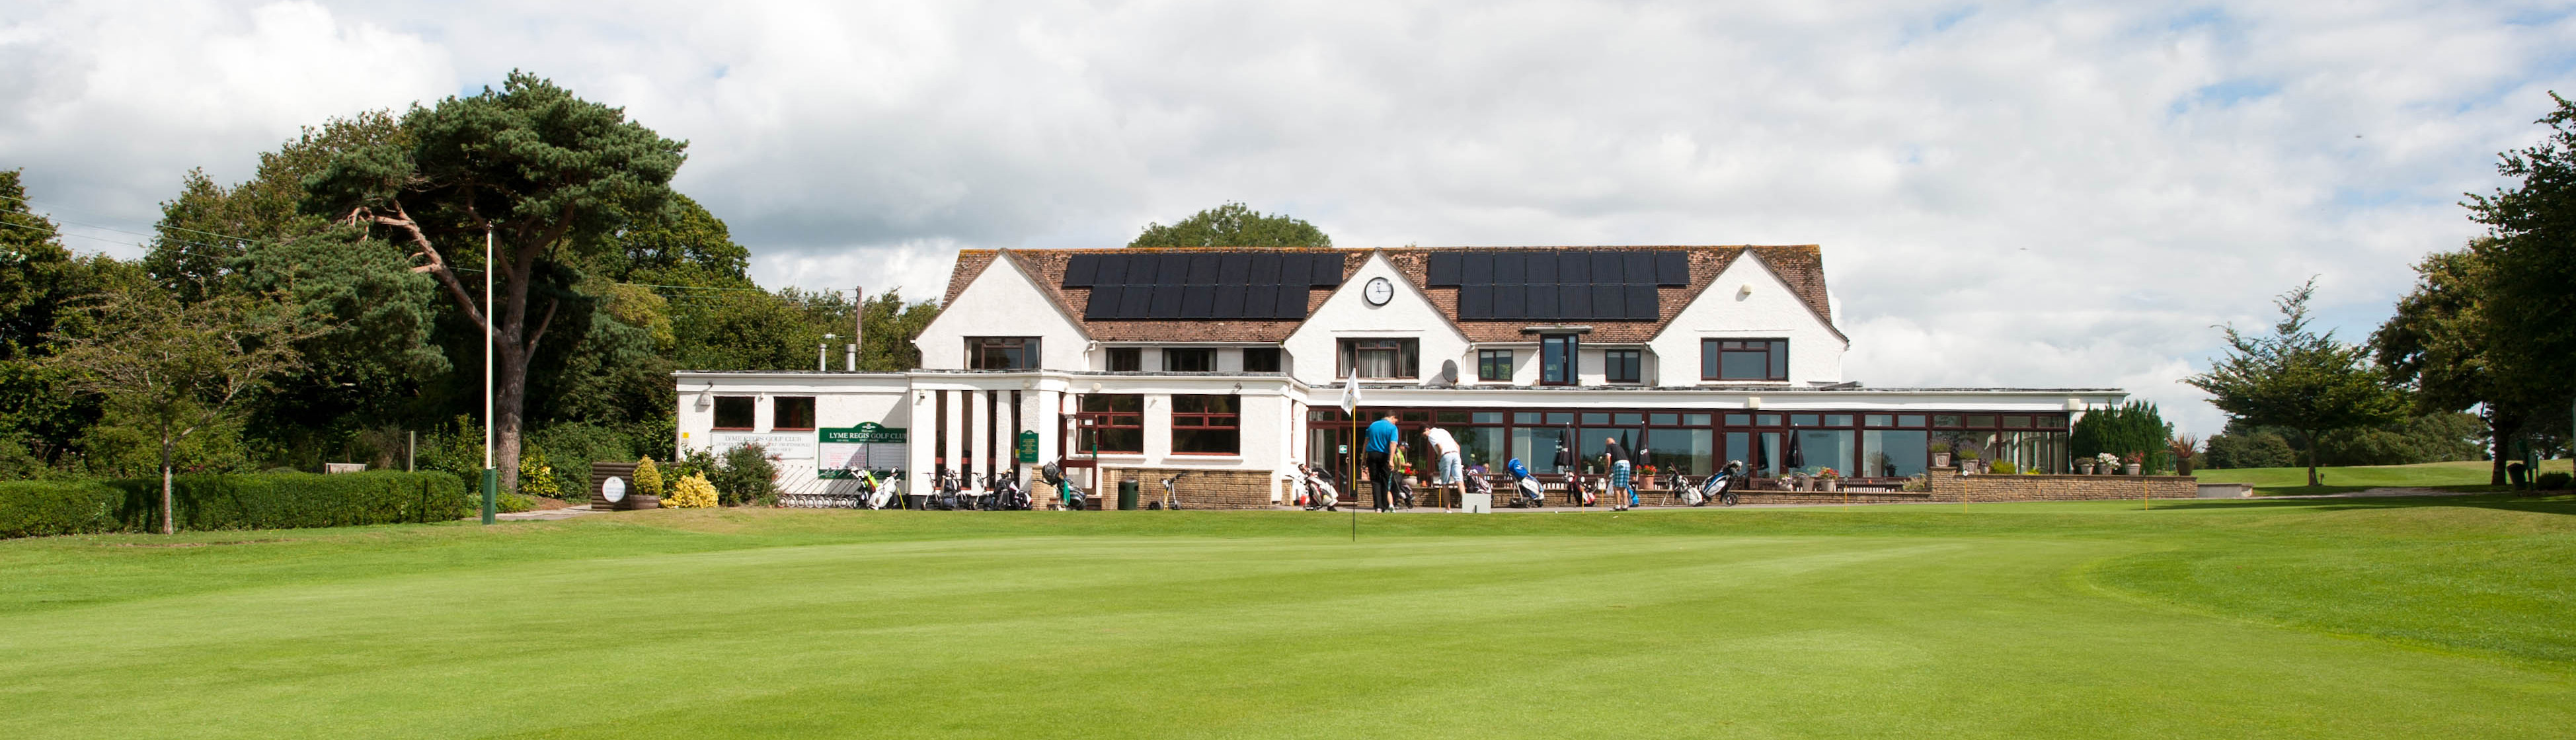 Lyme Regis Golf Club for hire